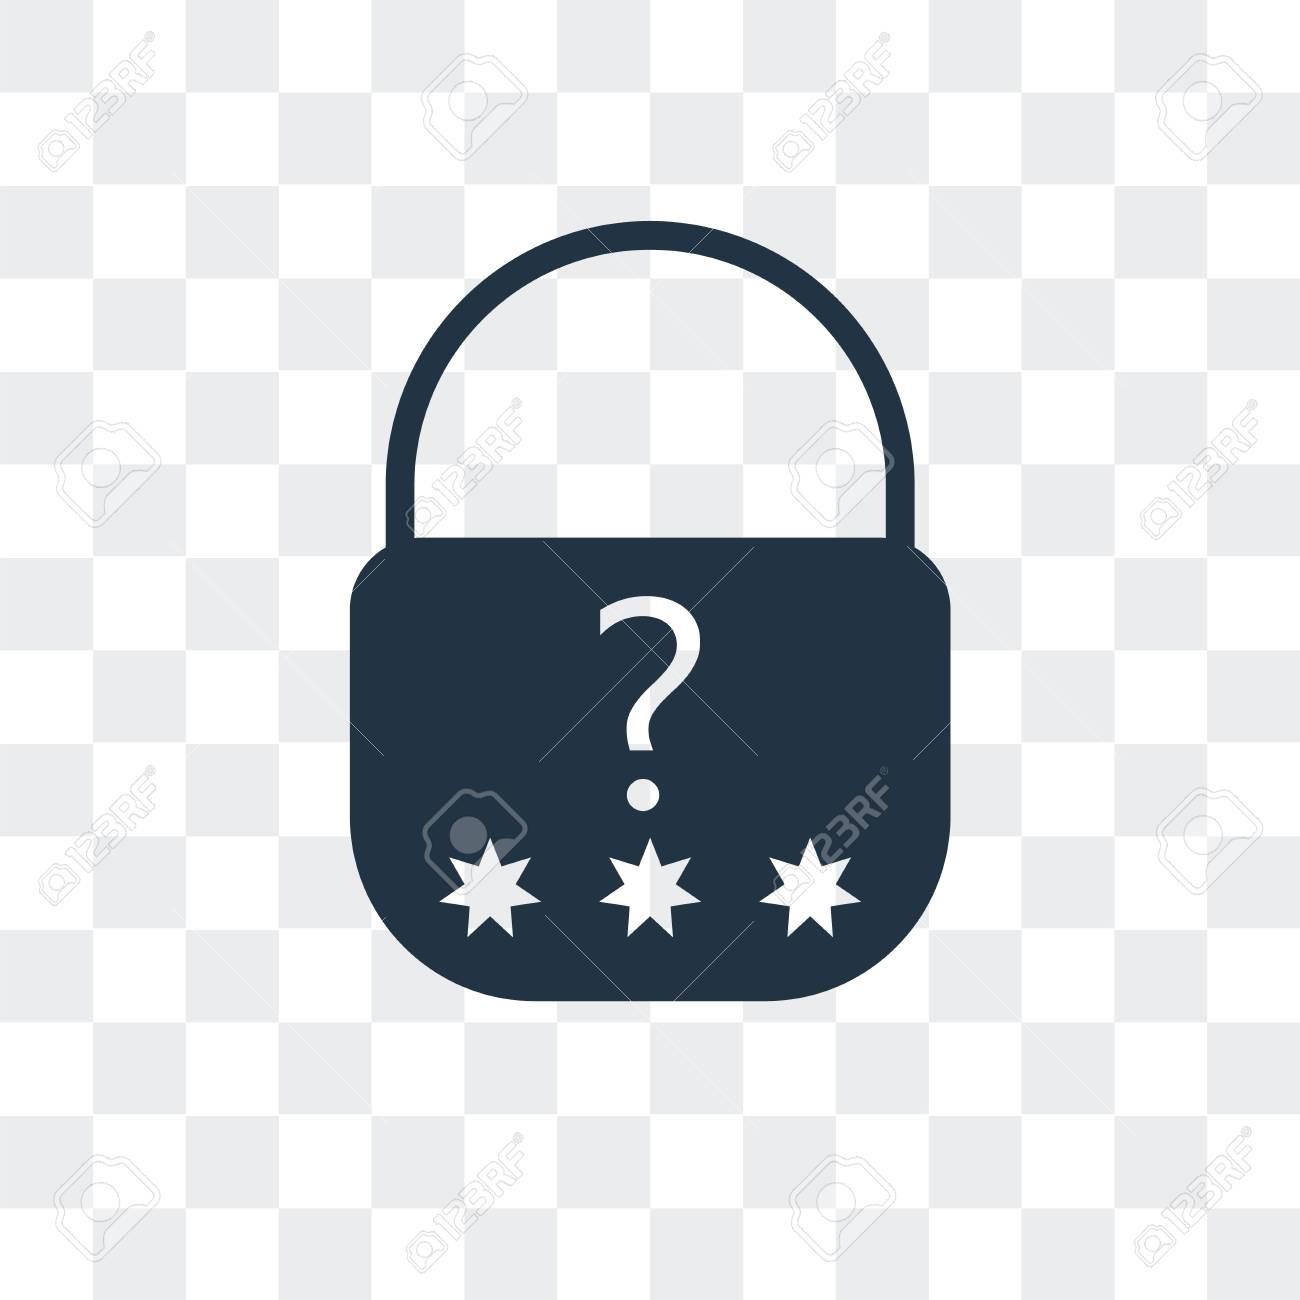 123Rf Password password vector icon isolated on transparent background, password